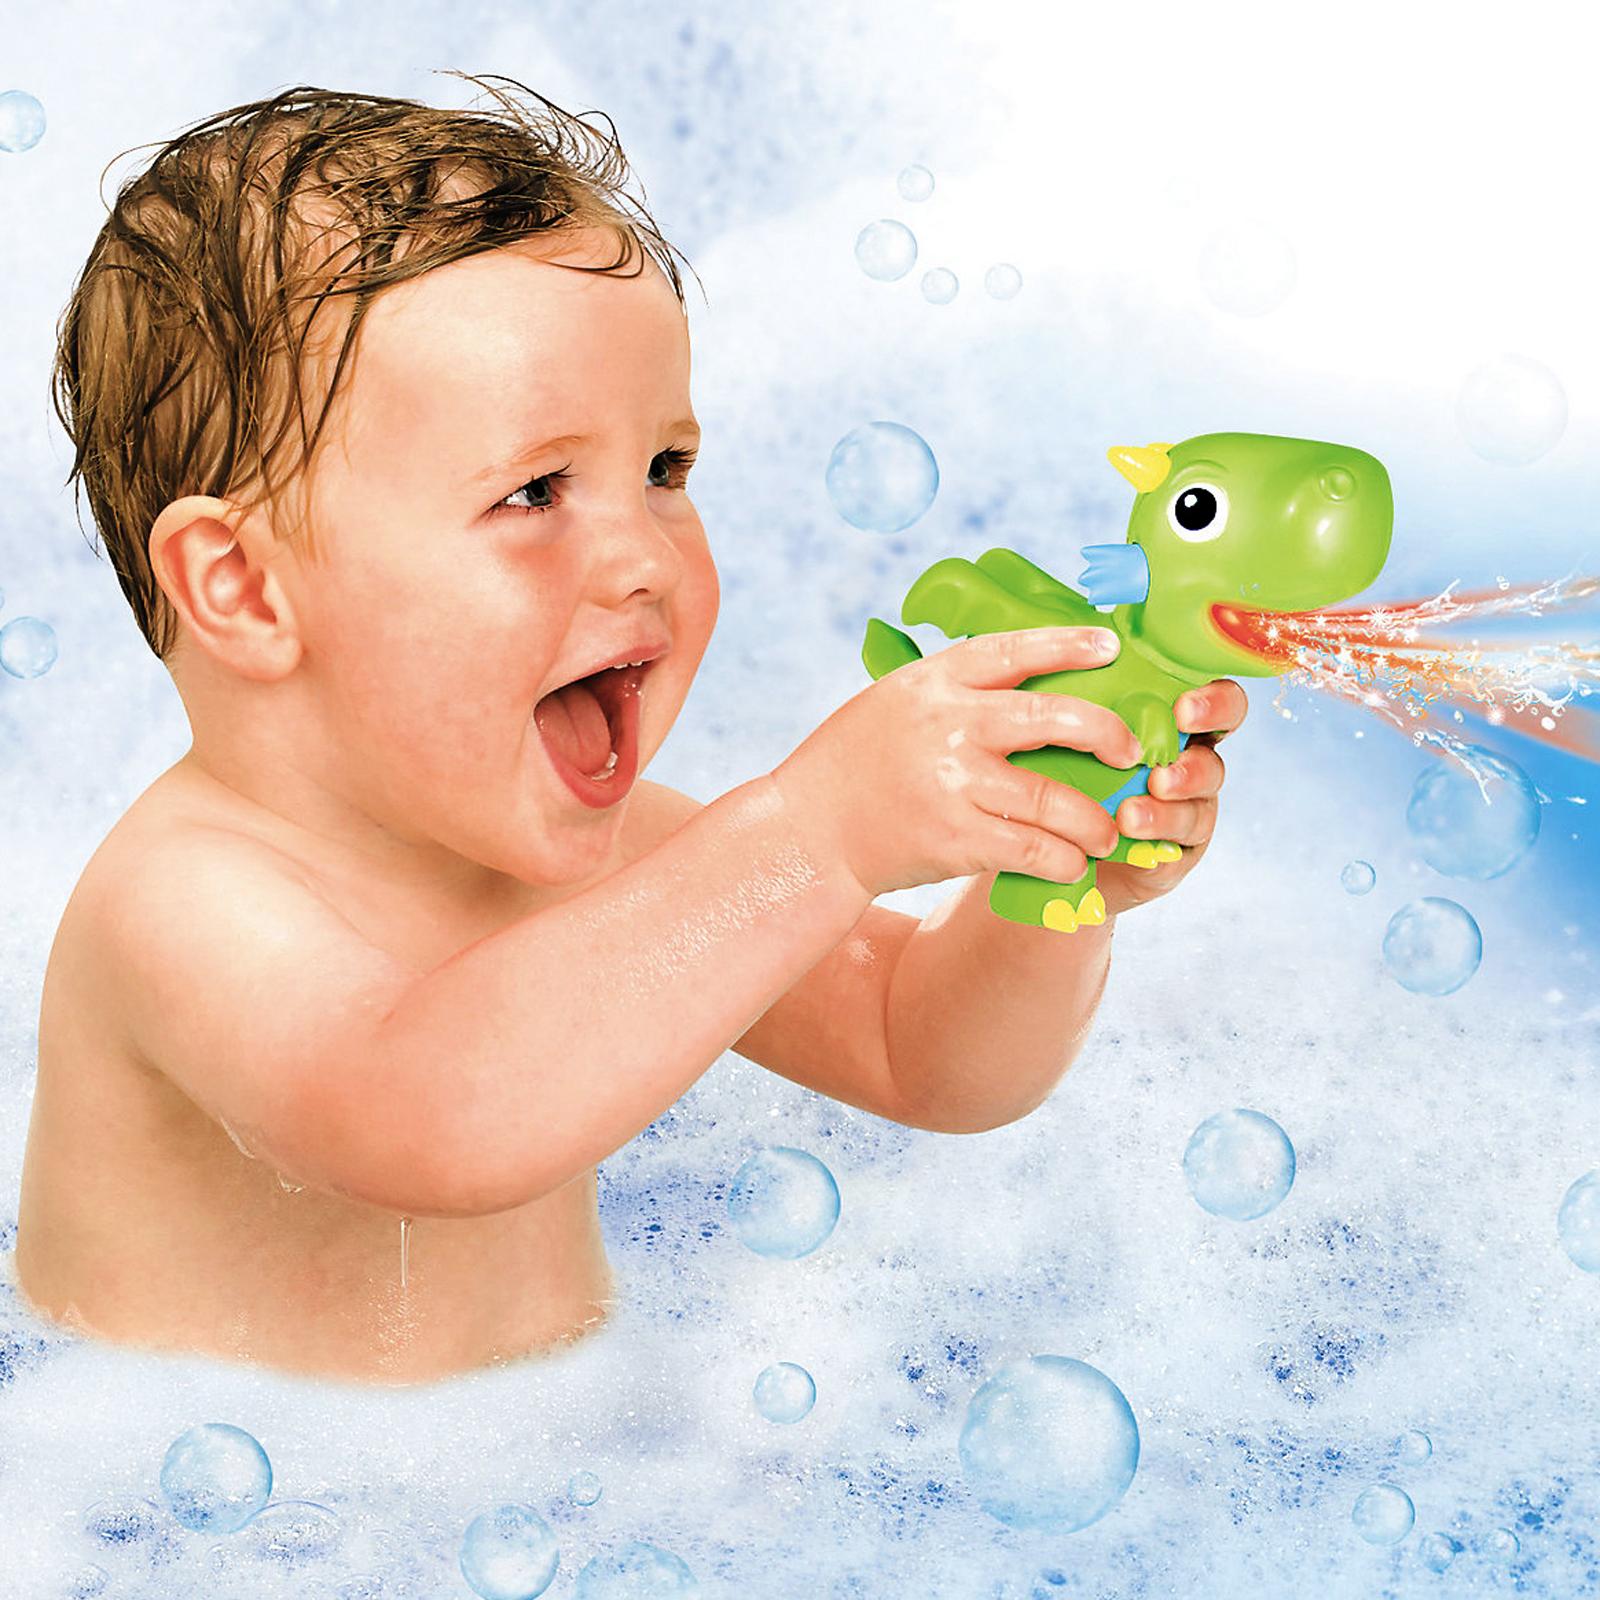 Tomy Light Up Bath Dragon